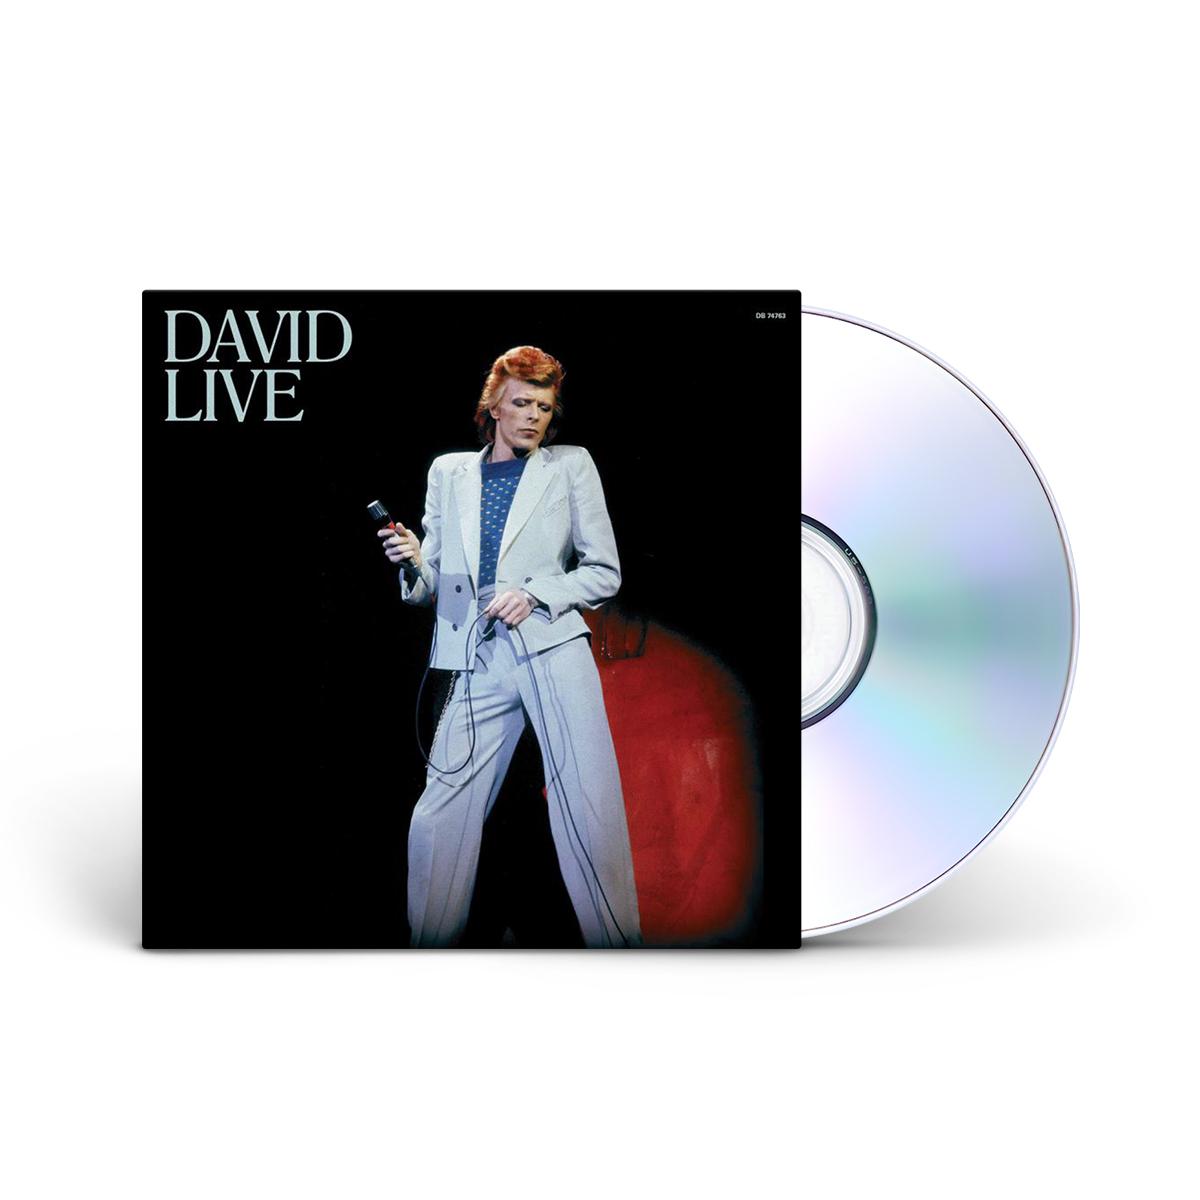 David Bowie David Live (2005 Mix) (Remastered Version) 2CD